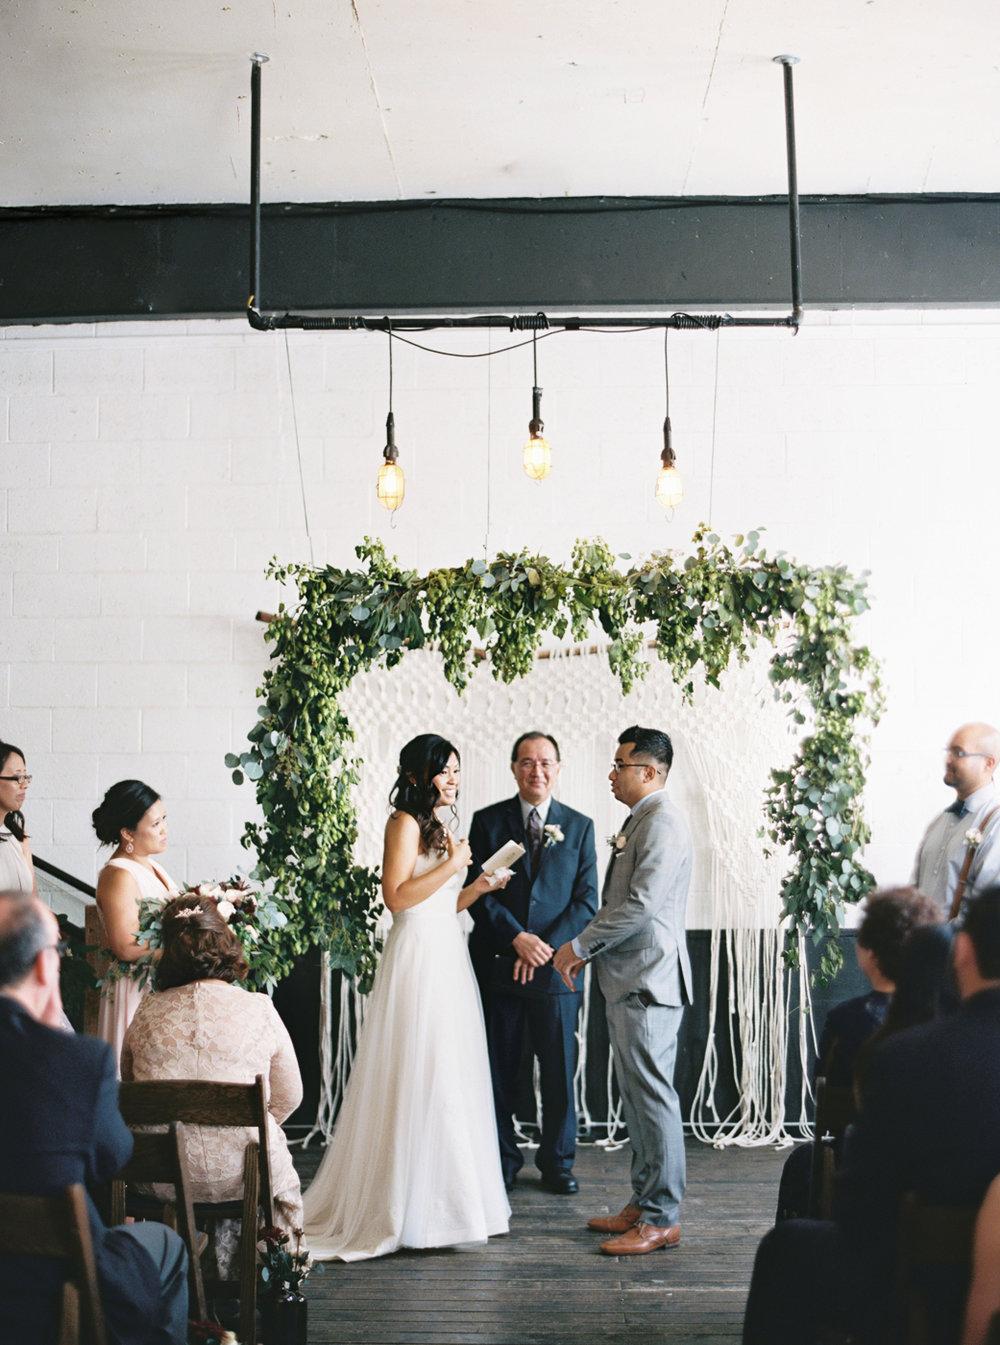 044Union_Pine_Portland_Oregon_Wedding_Photography.jpg